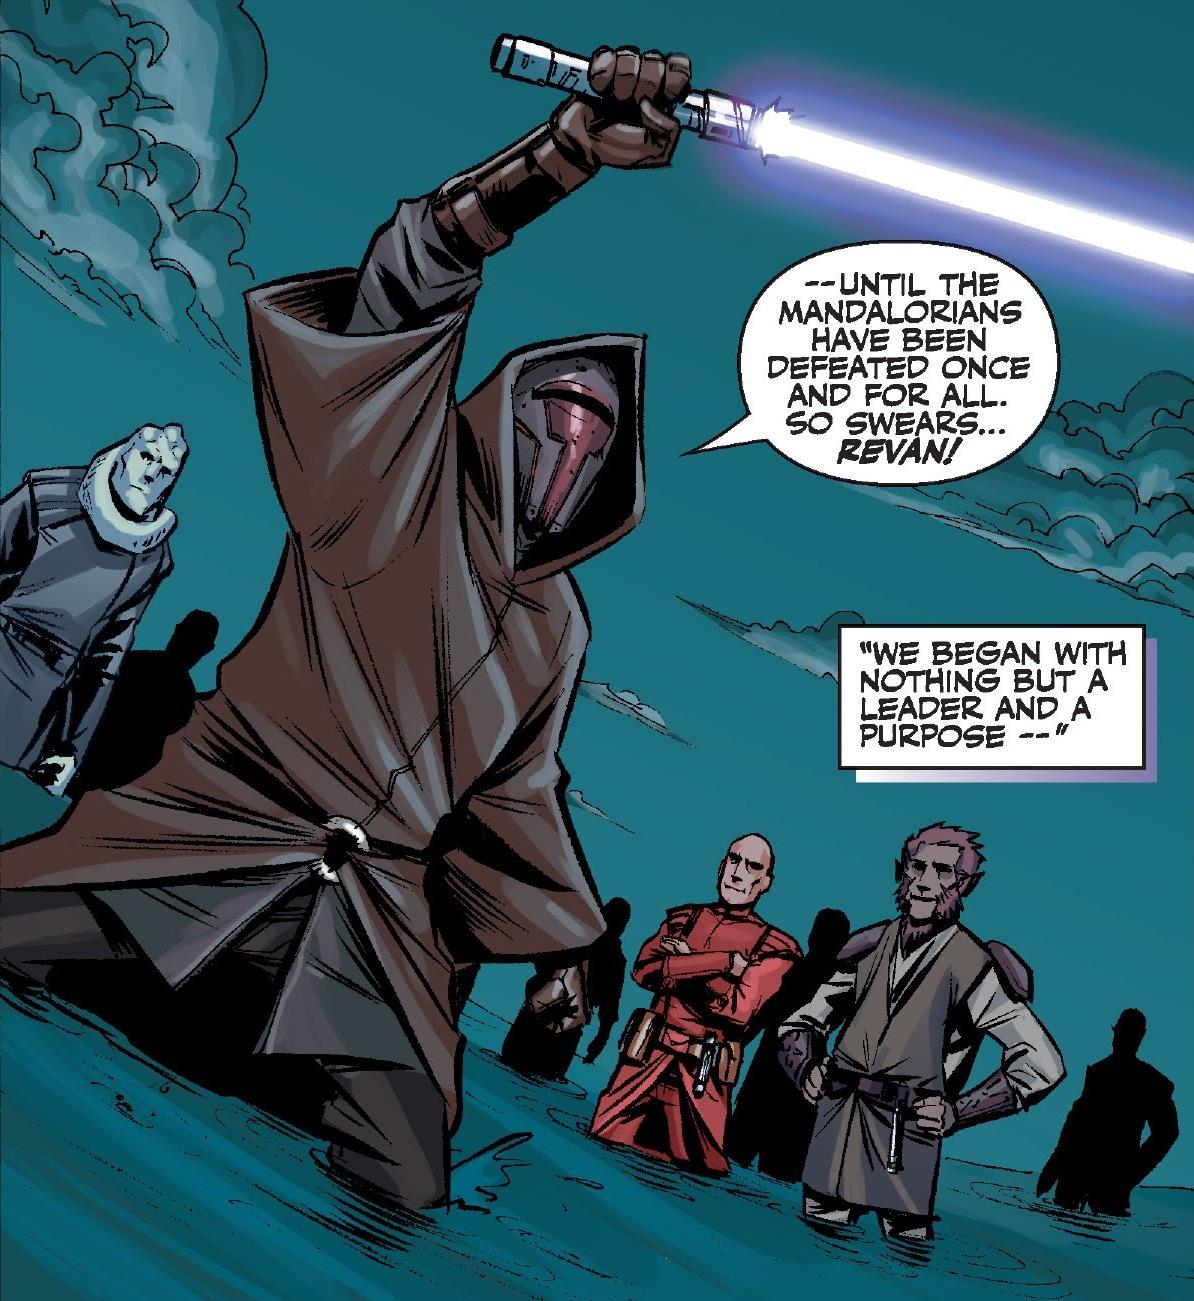 Clone Wars, Mandalorian Jedi. by JohnGWolf on DeviantArt